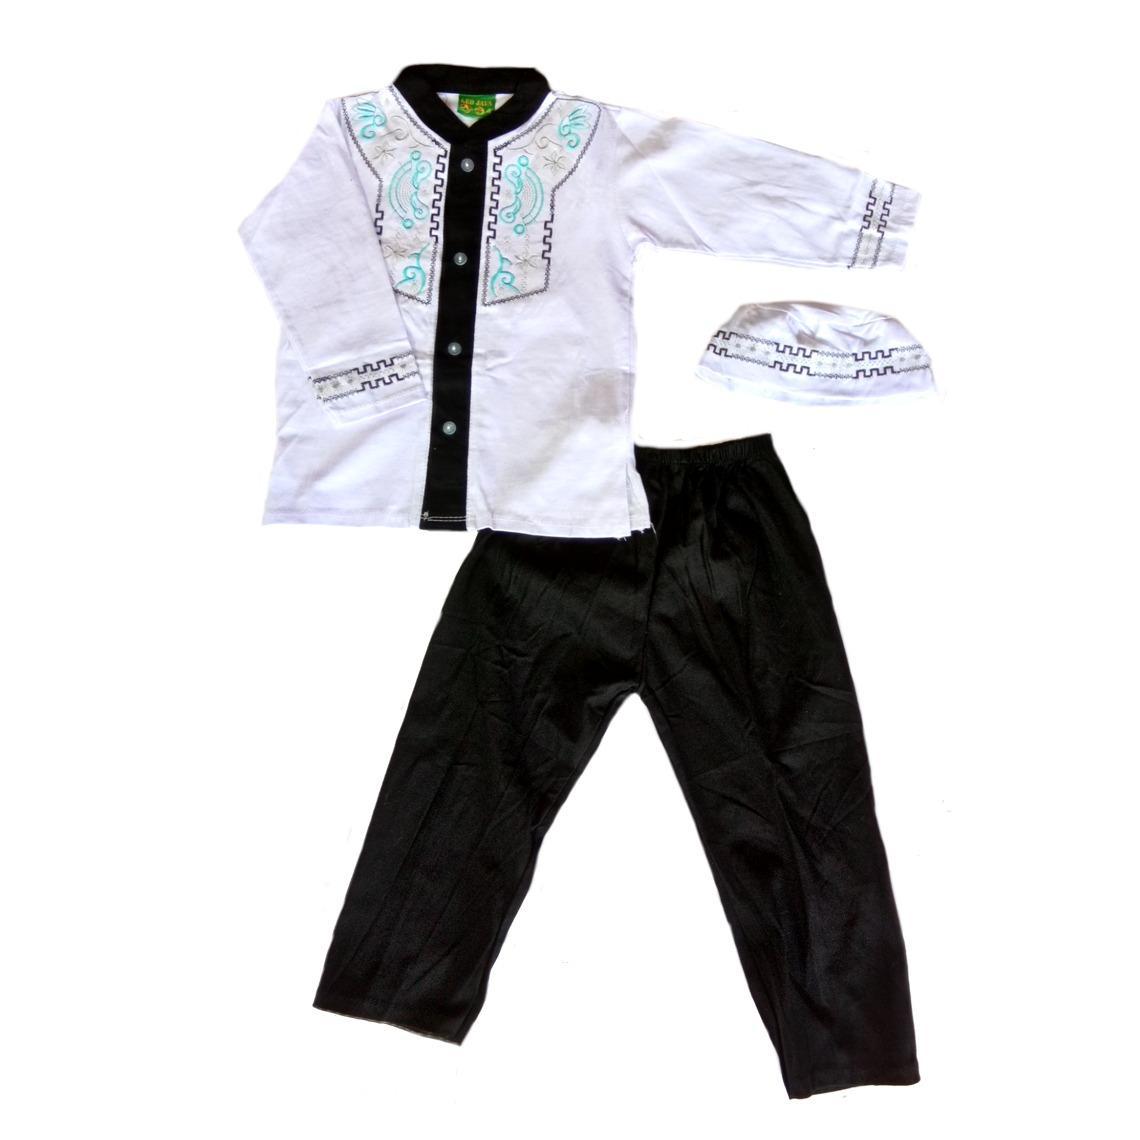 Ghali Koko Muslim Anak - Baju Koko Bayi Anak New / Baju Setelan Muslim Bayi dan Anak - Baju Anak Murah Setelan Koko Murah Koko Bayi Koko Murah -